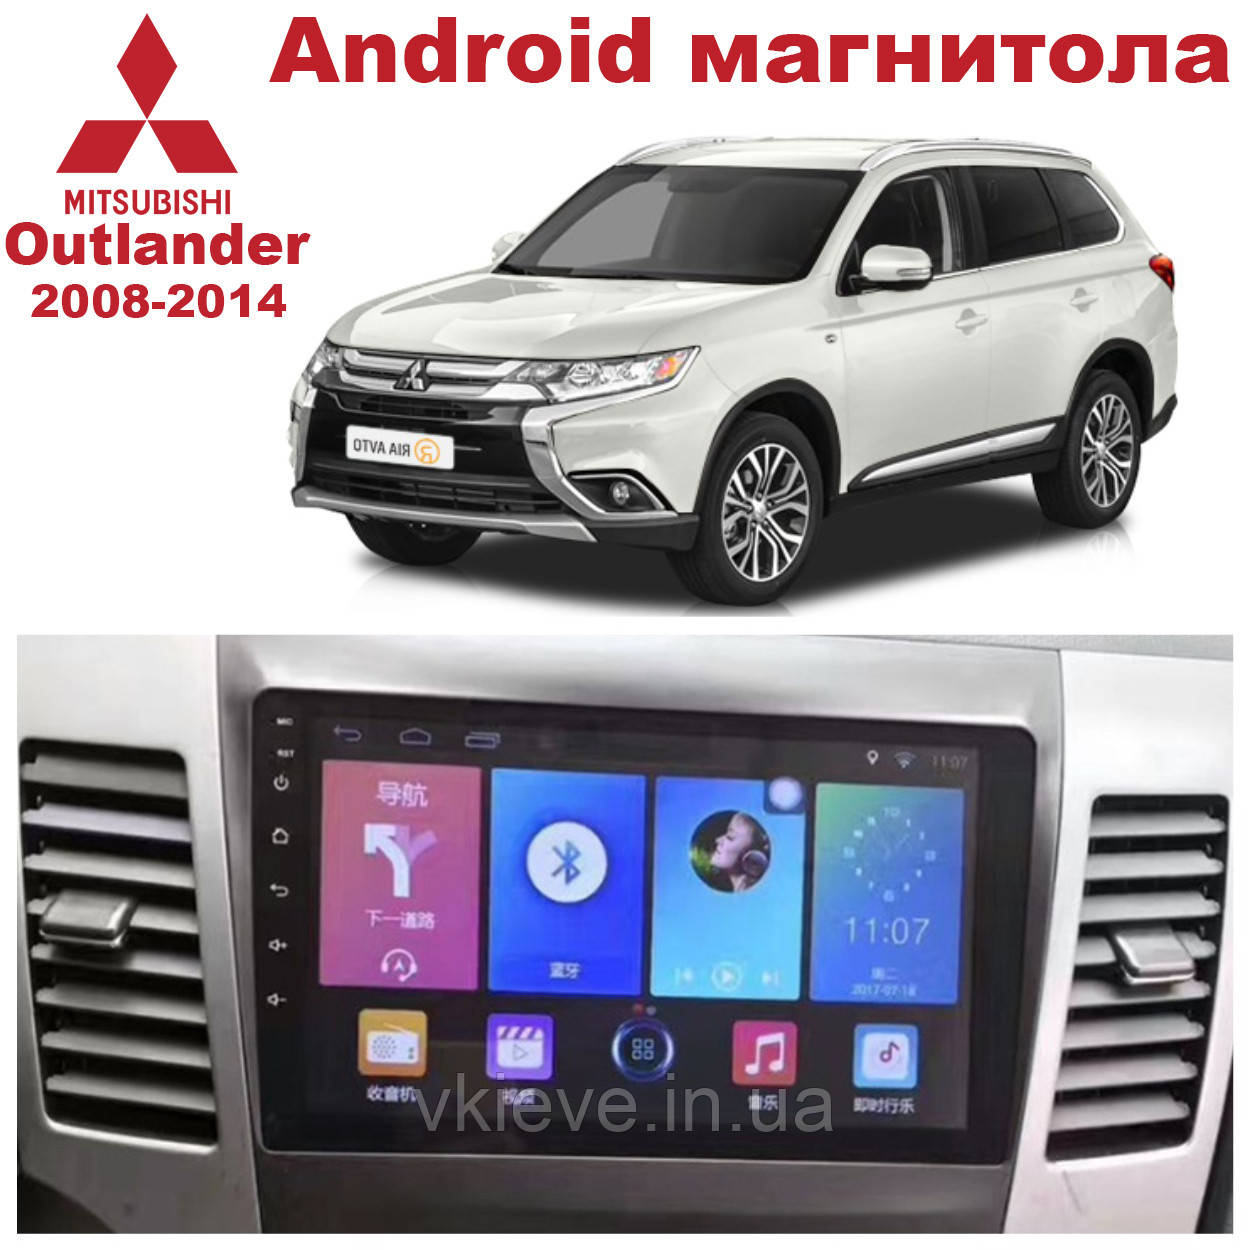 Штатная автомагнитола для Mitsubishi Outlander 2008-2014 на ANDROID 8.1 (М-МА-9)